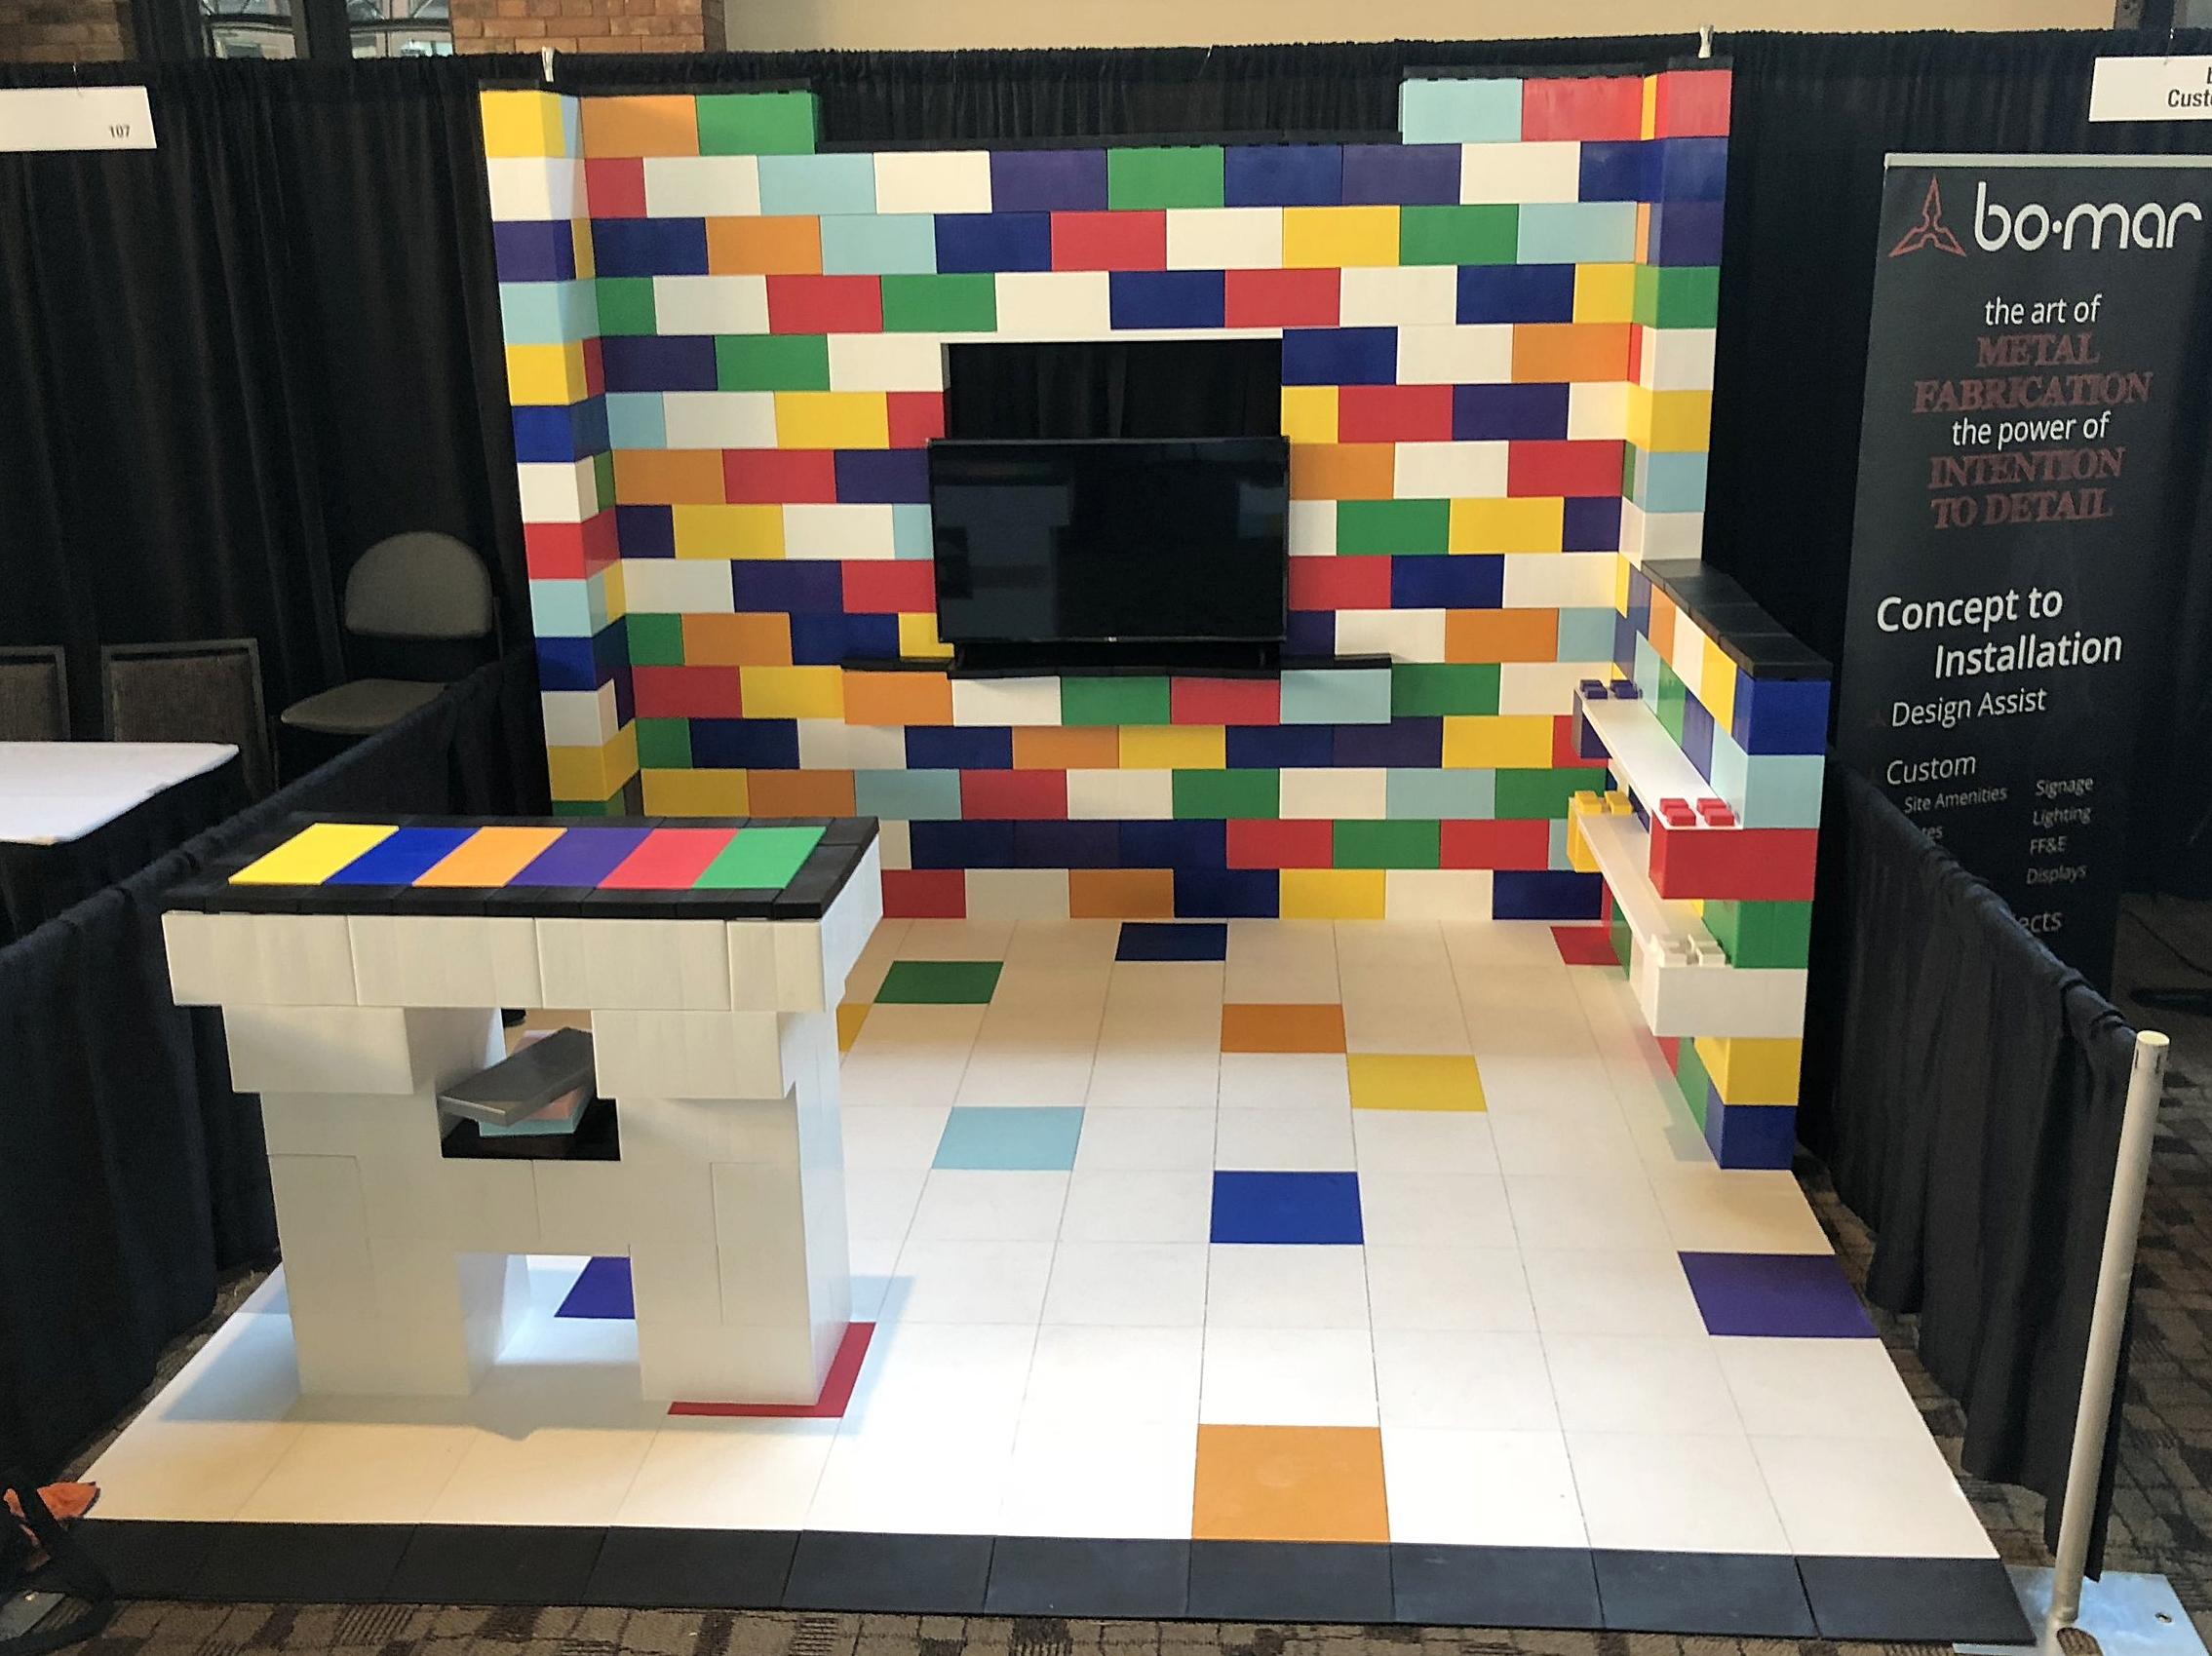 Alternate colors to create beautiful customized floor patterns.